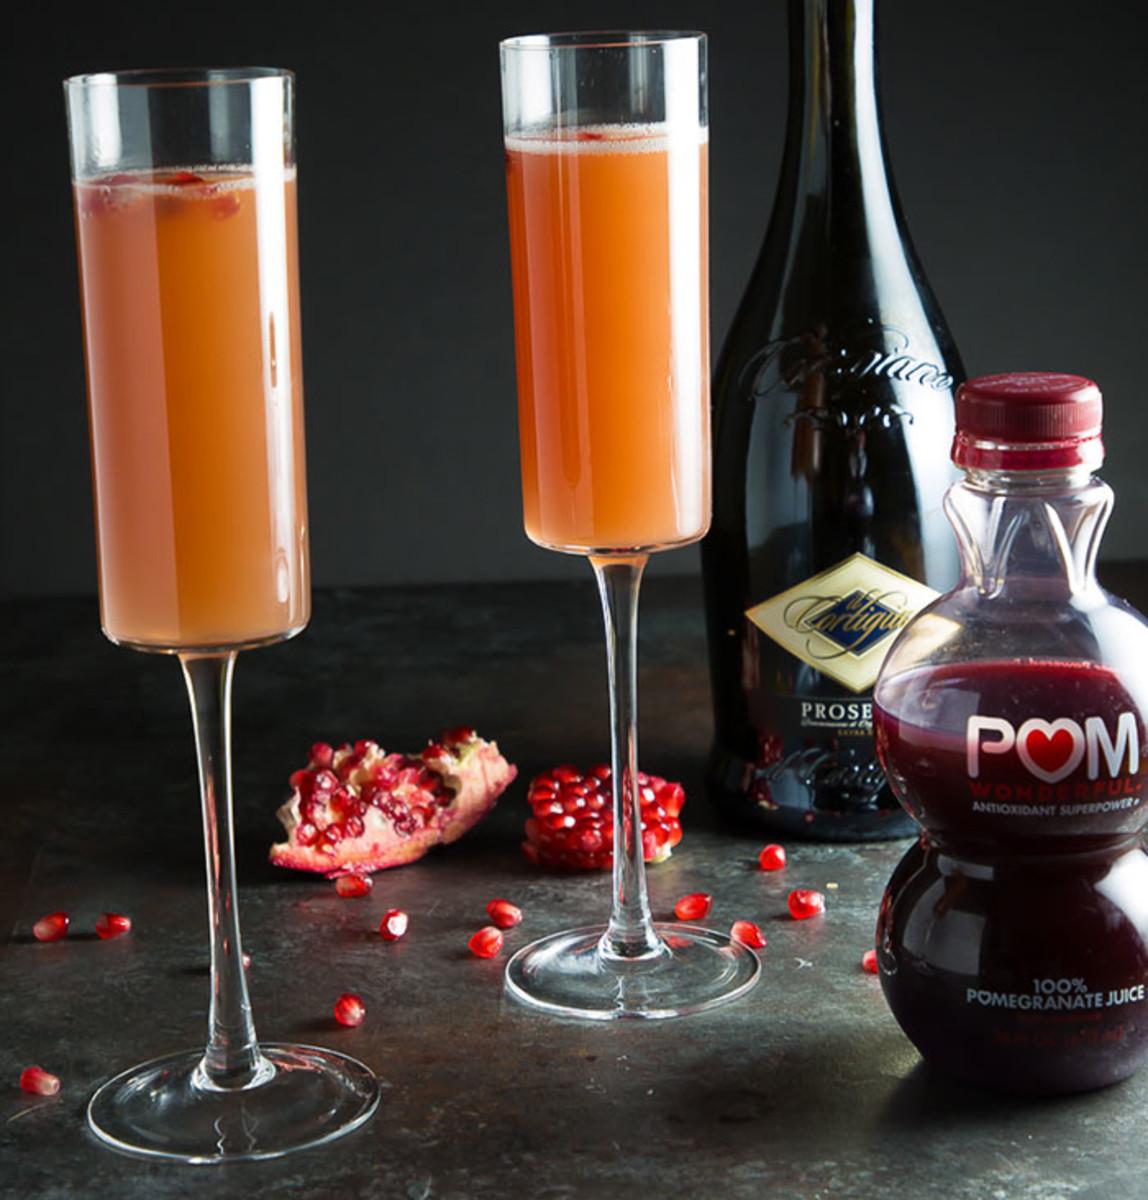 Pomegranate Mimosa Ingredients #mimosa #fallcocktails